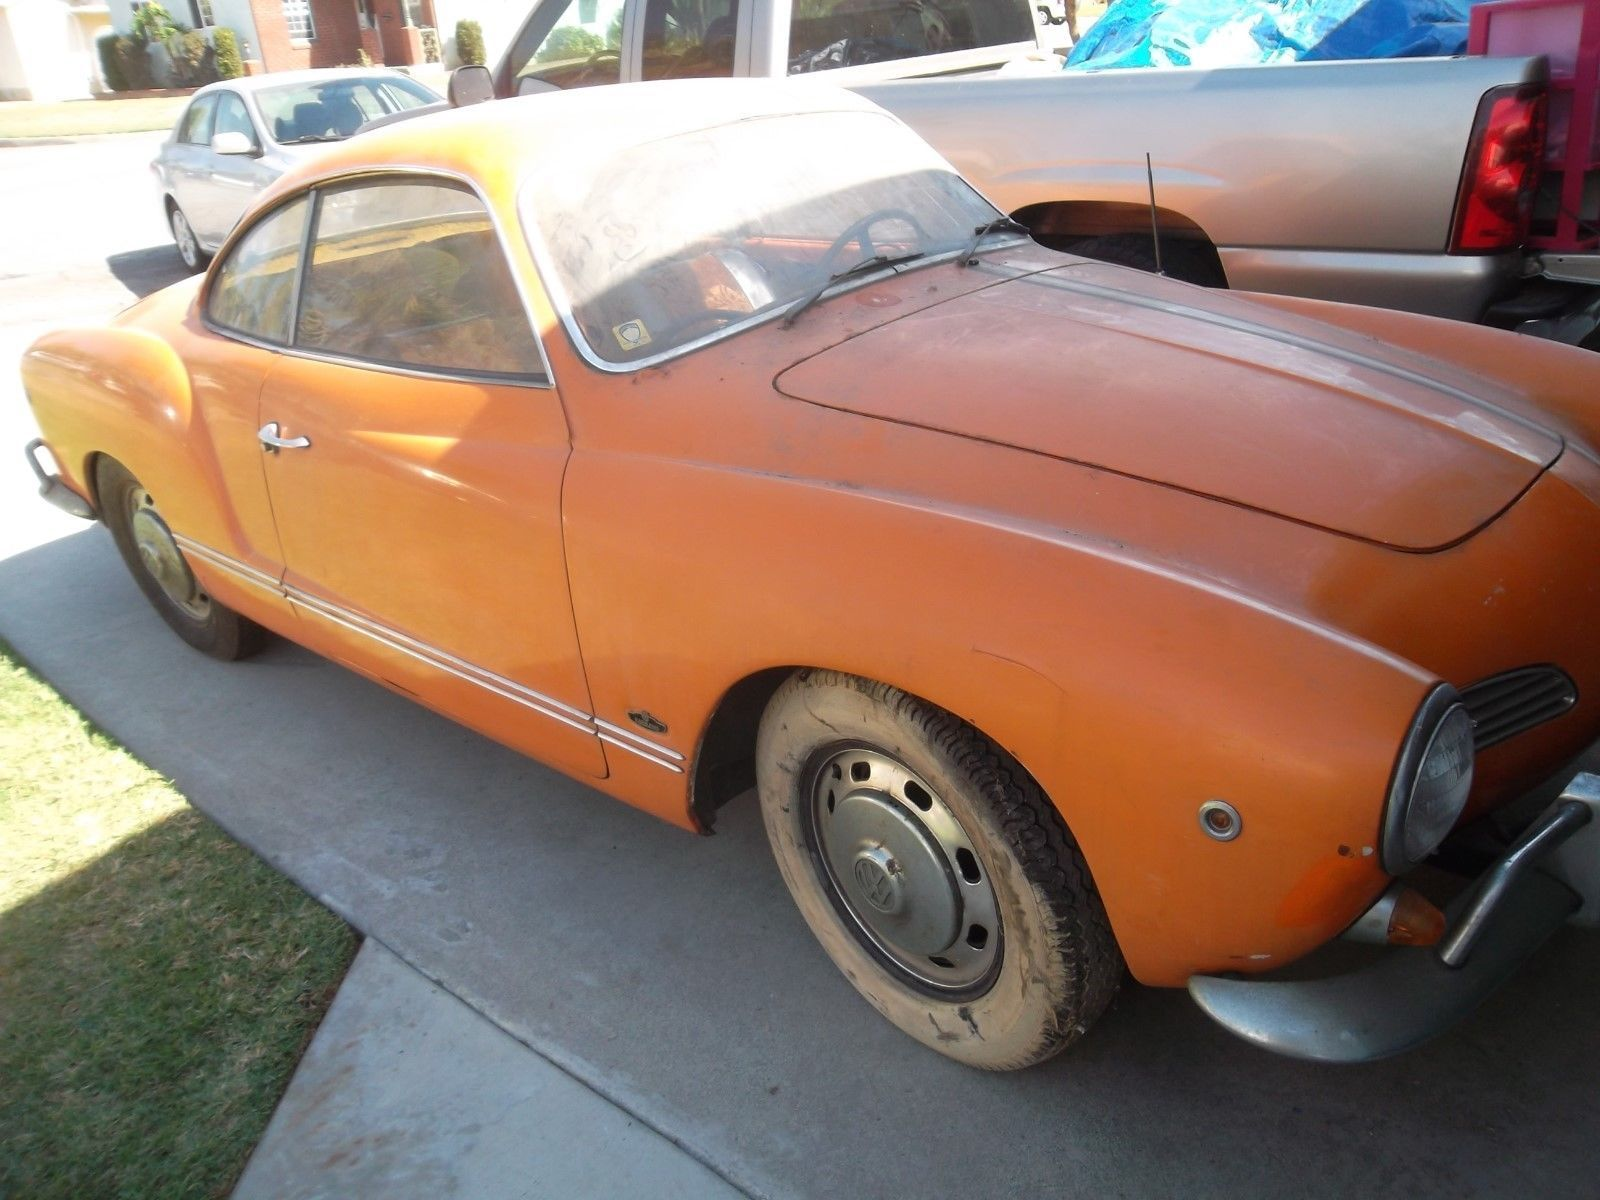 eBay: 1967 Volkswagen Karmann Ghia 1967 VW Karmann Ghia - One Owner ...